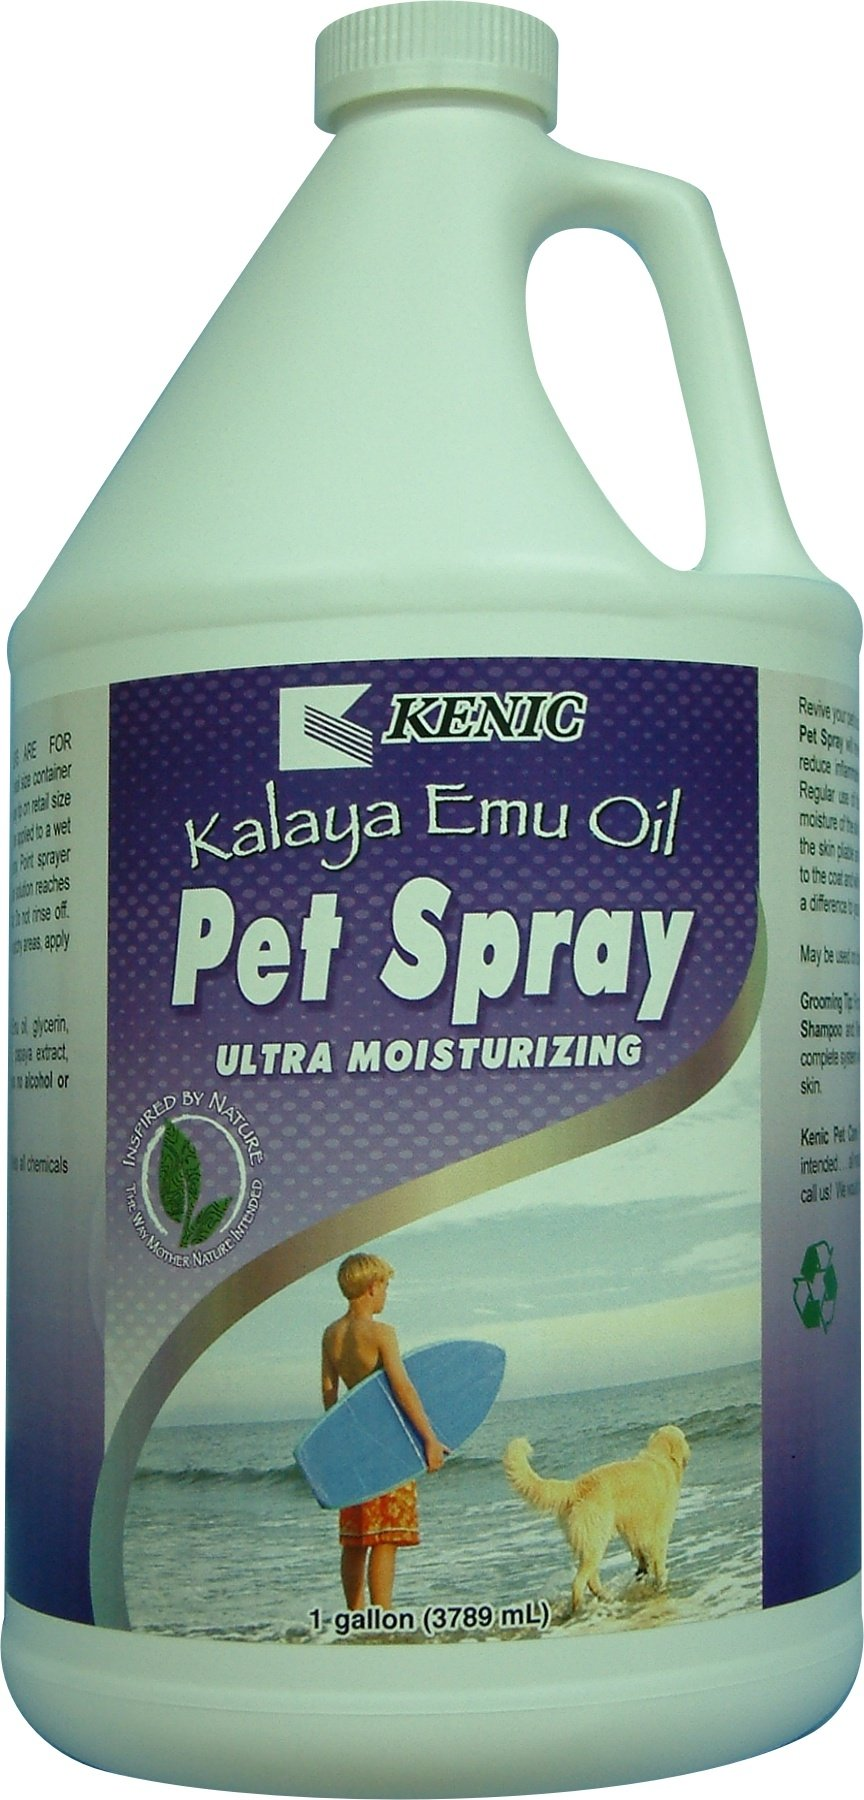 Kenic Kalaya Emu Oil Pet Spray, 1-Gallon by Kenic